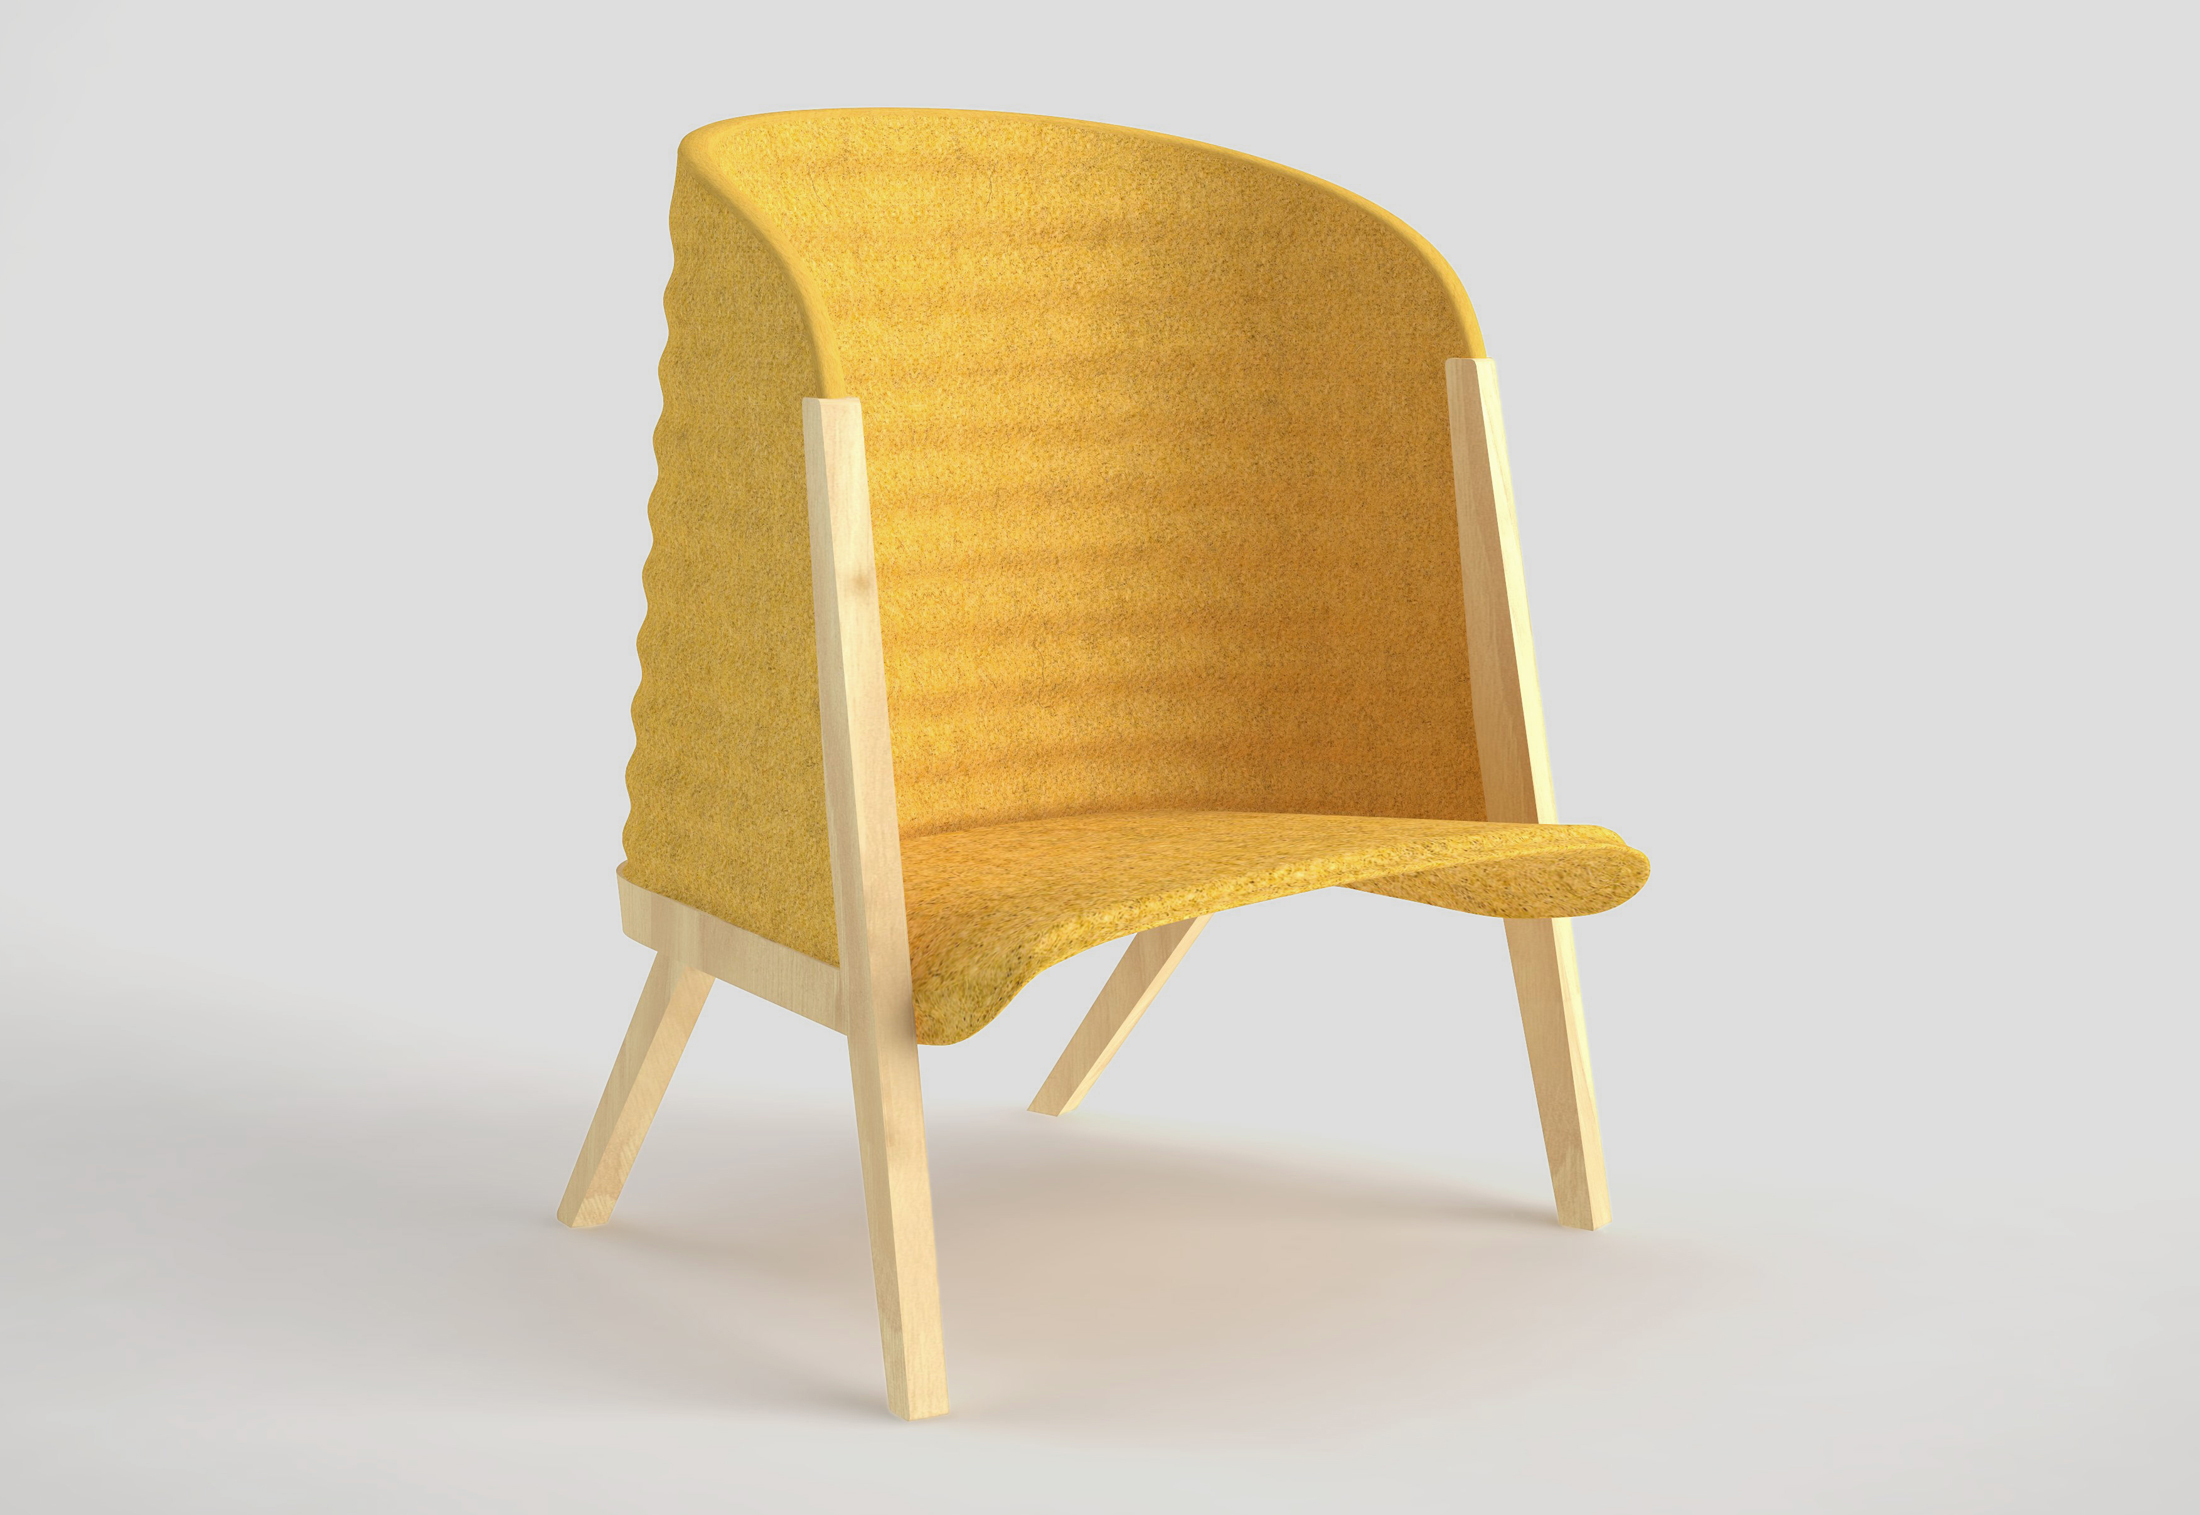 mafalda sessel hohe lehne von moroso stylepark. Black Bedroom Furniture Sets. Home Design Ideas